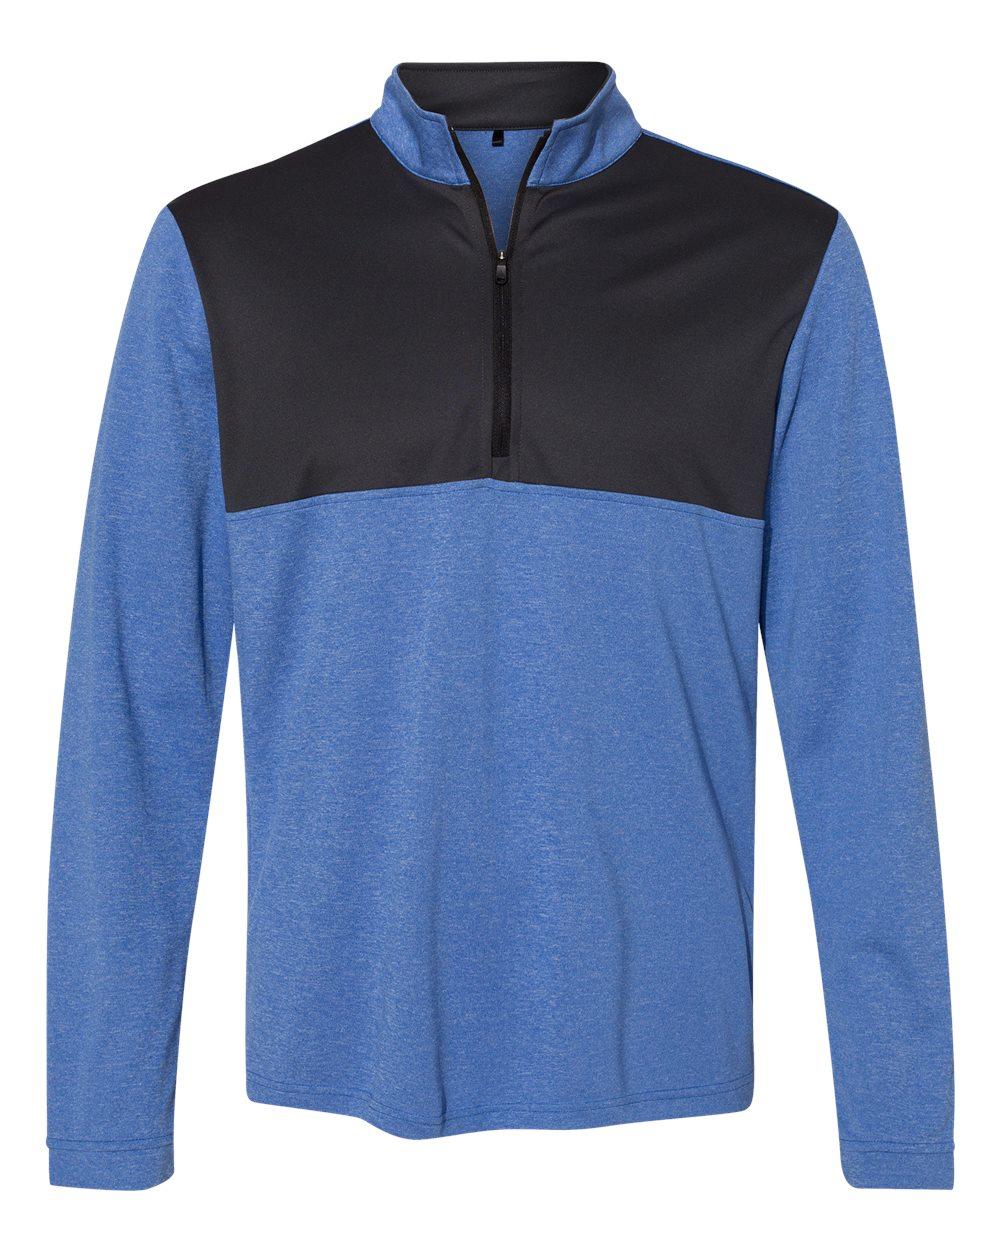 Adidas-Mens-Lightweight-UPF-pullover-Shirt-Warmup-A280-up-to-4XL thumbnail 12